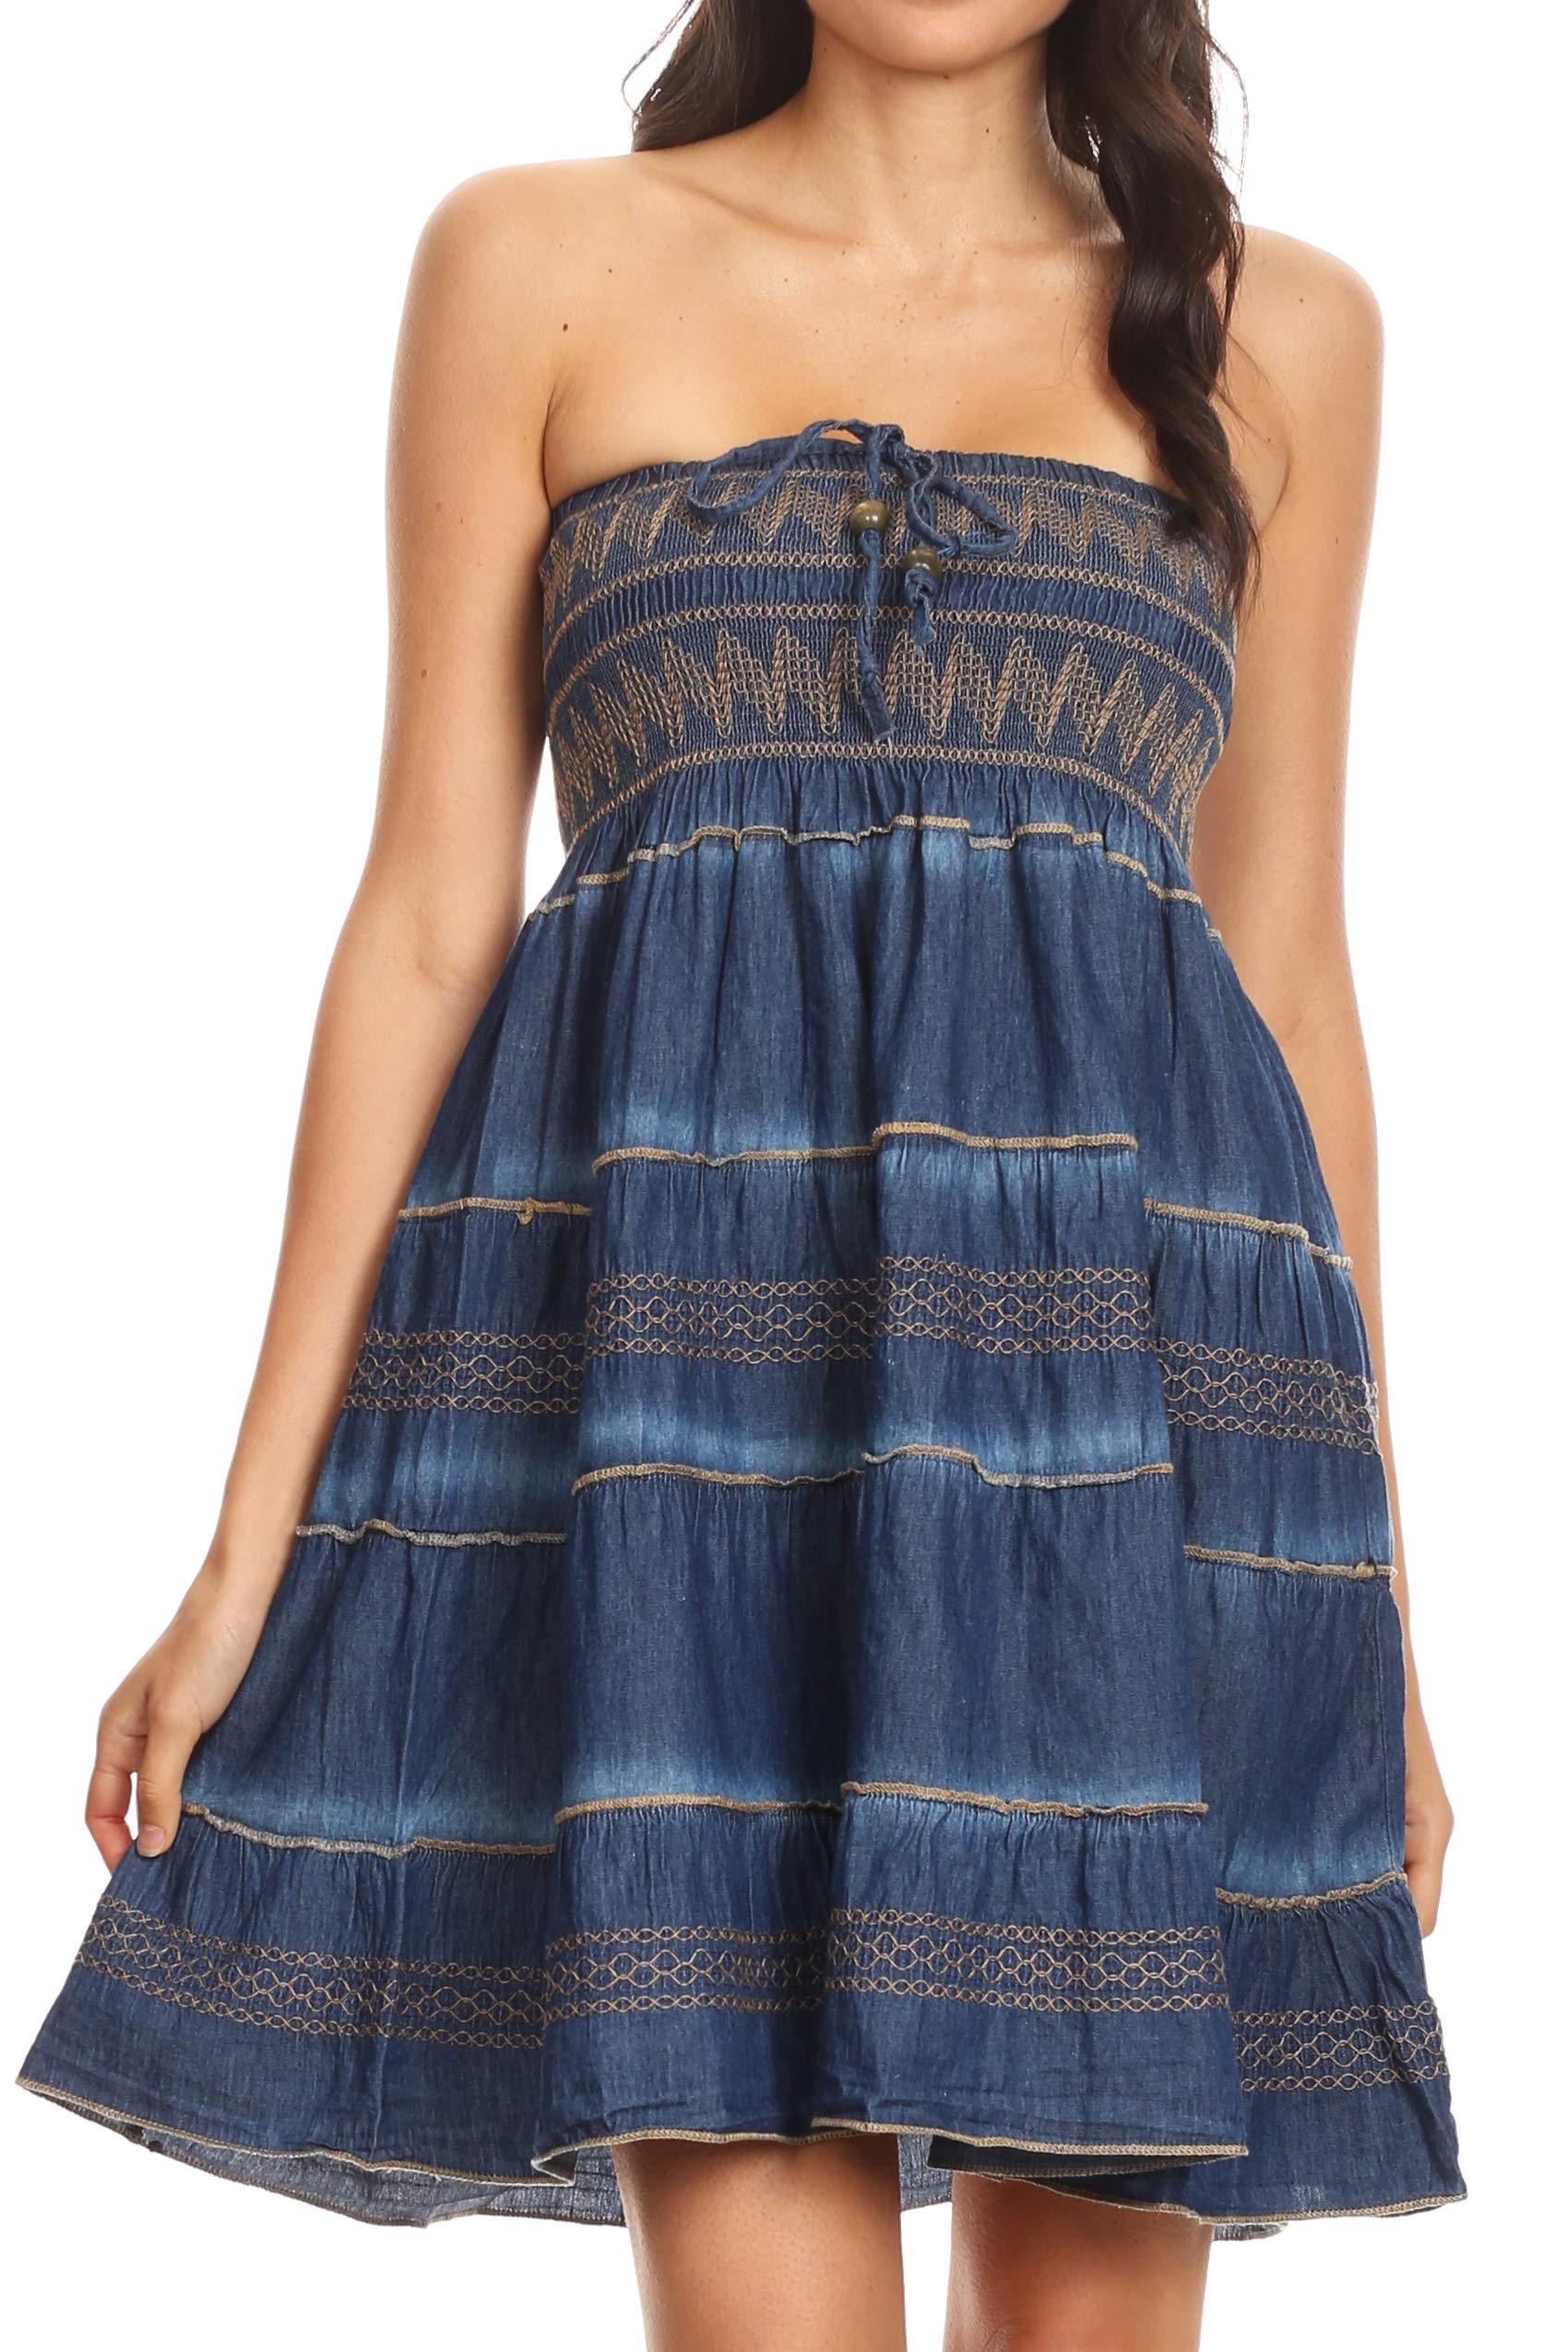 2f3178311a Sakkas Eva Womens Denim Strapless Tube Top Smock Short Sleeveless Dress  Chambray